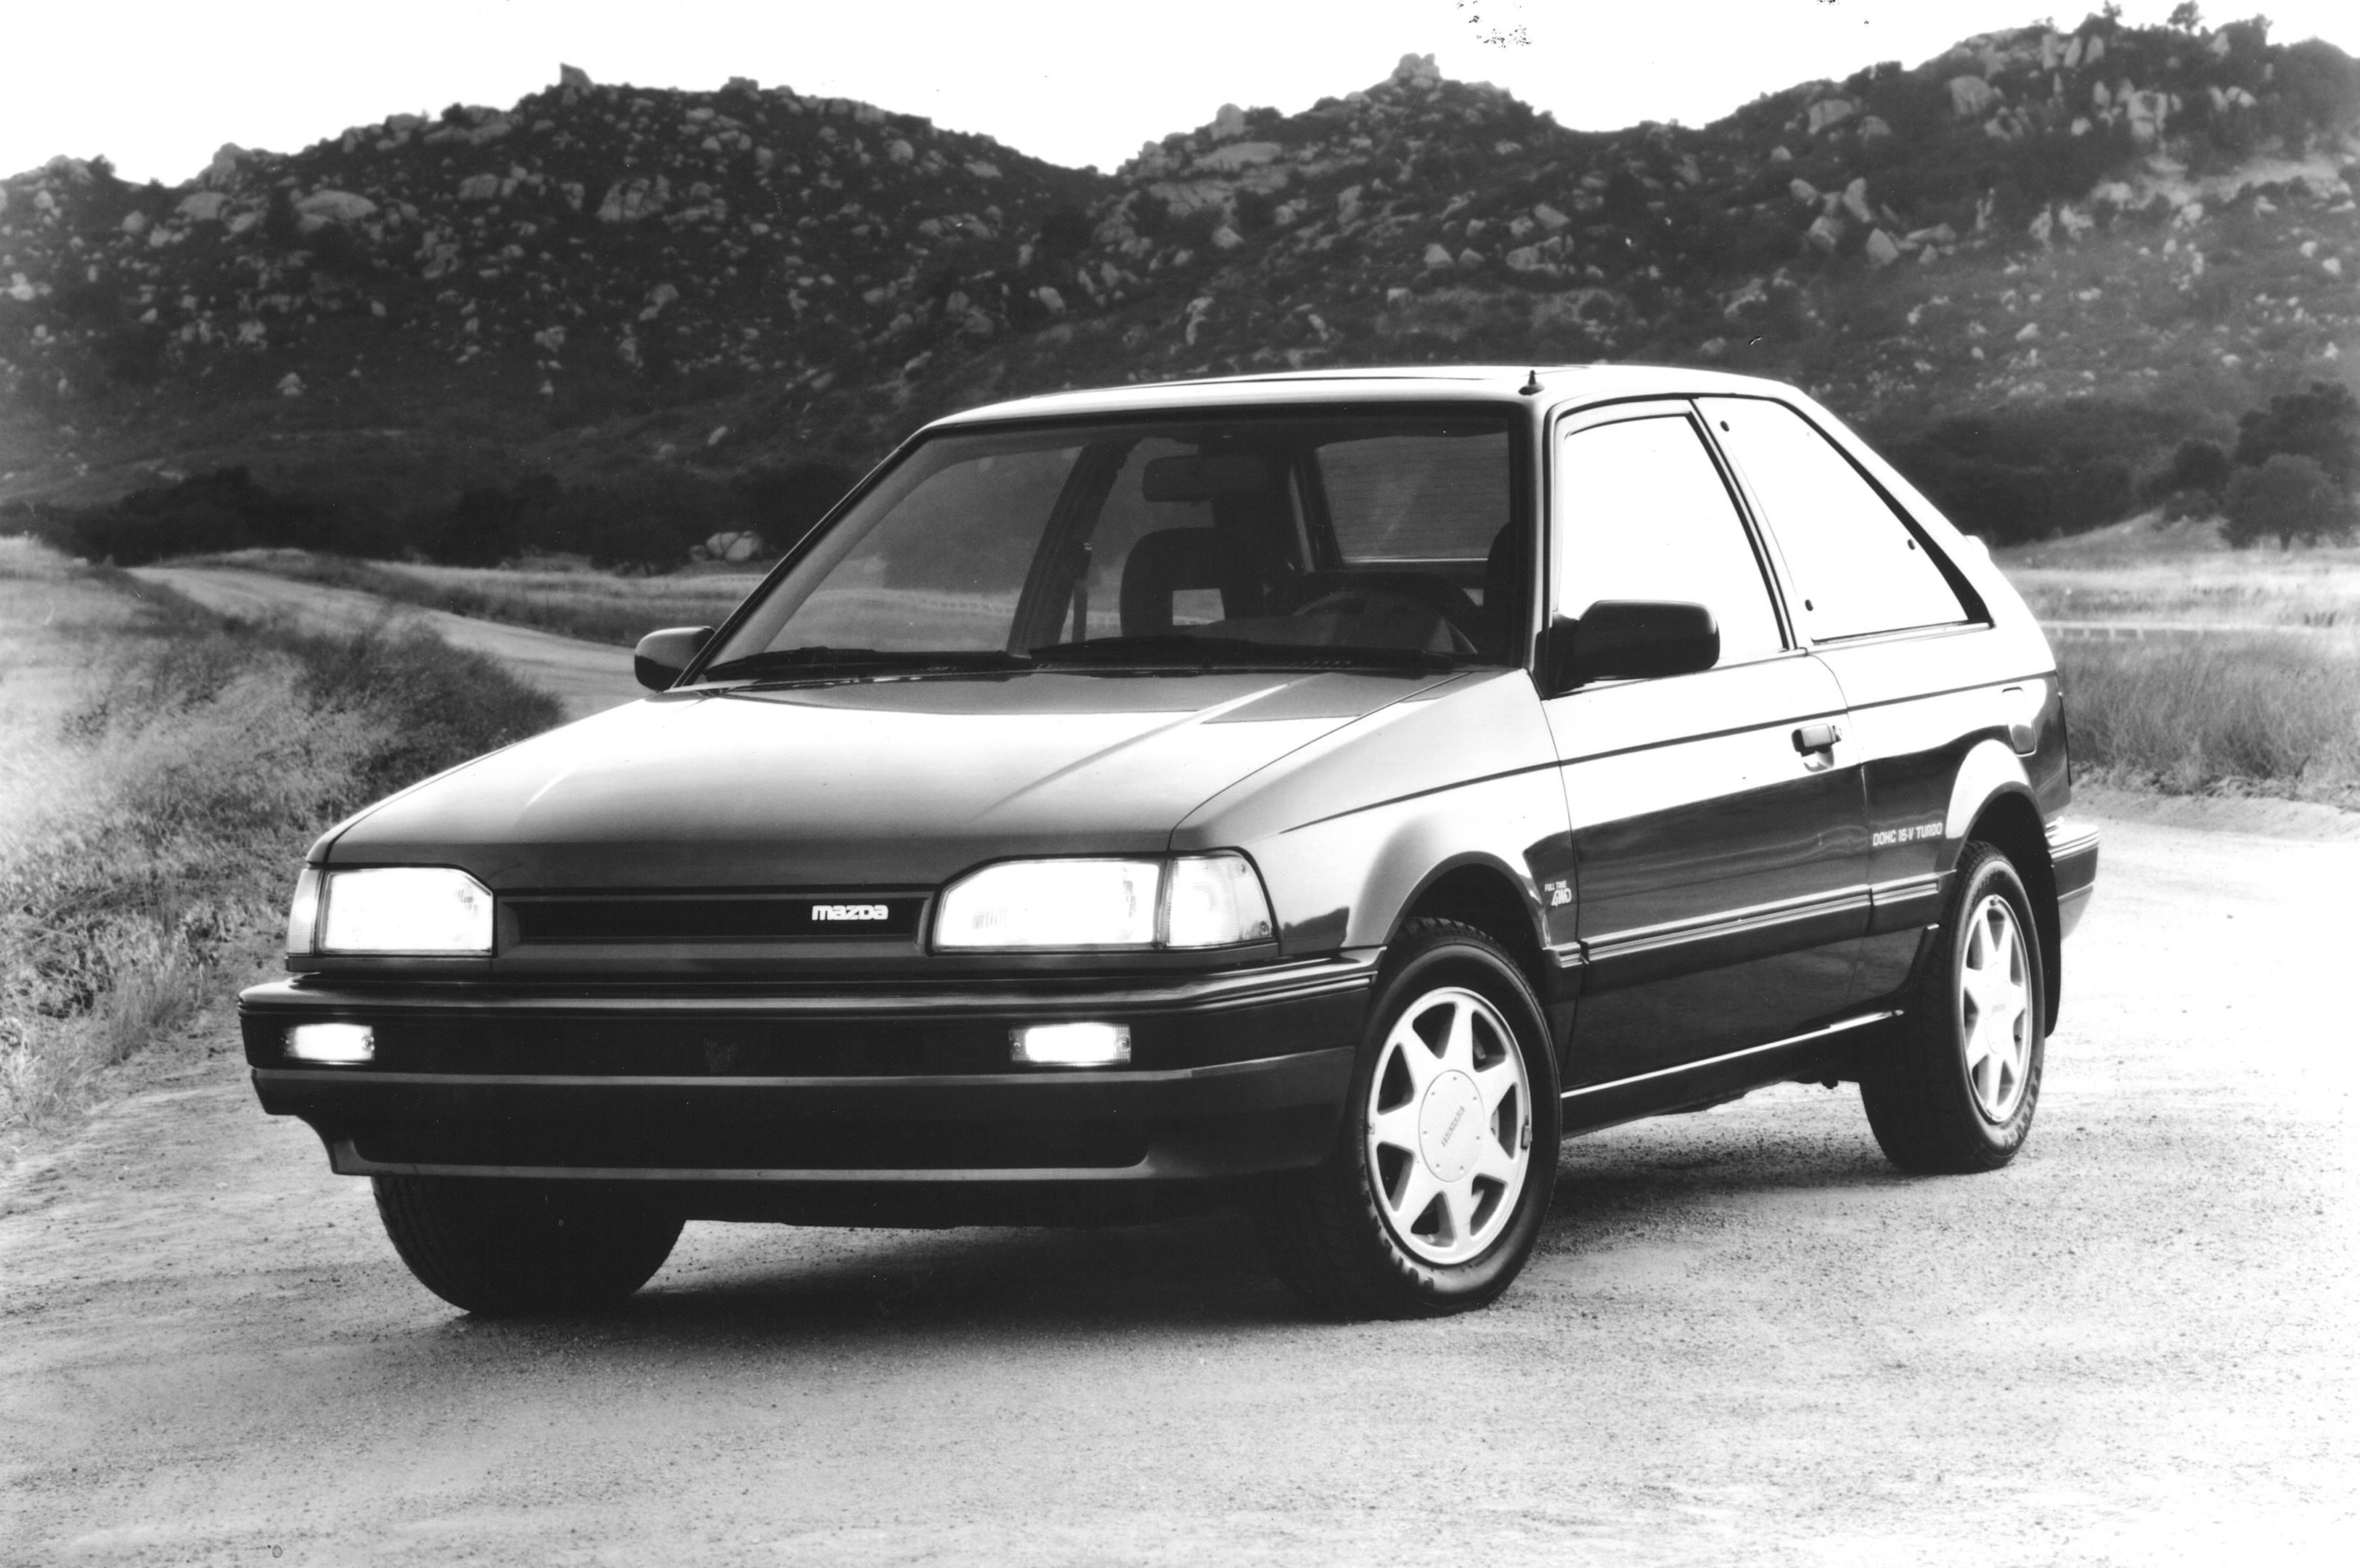 black and white 1988 Mazda 323 GTX Front